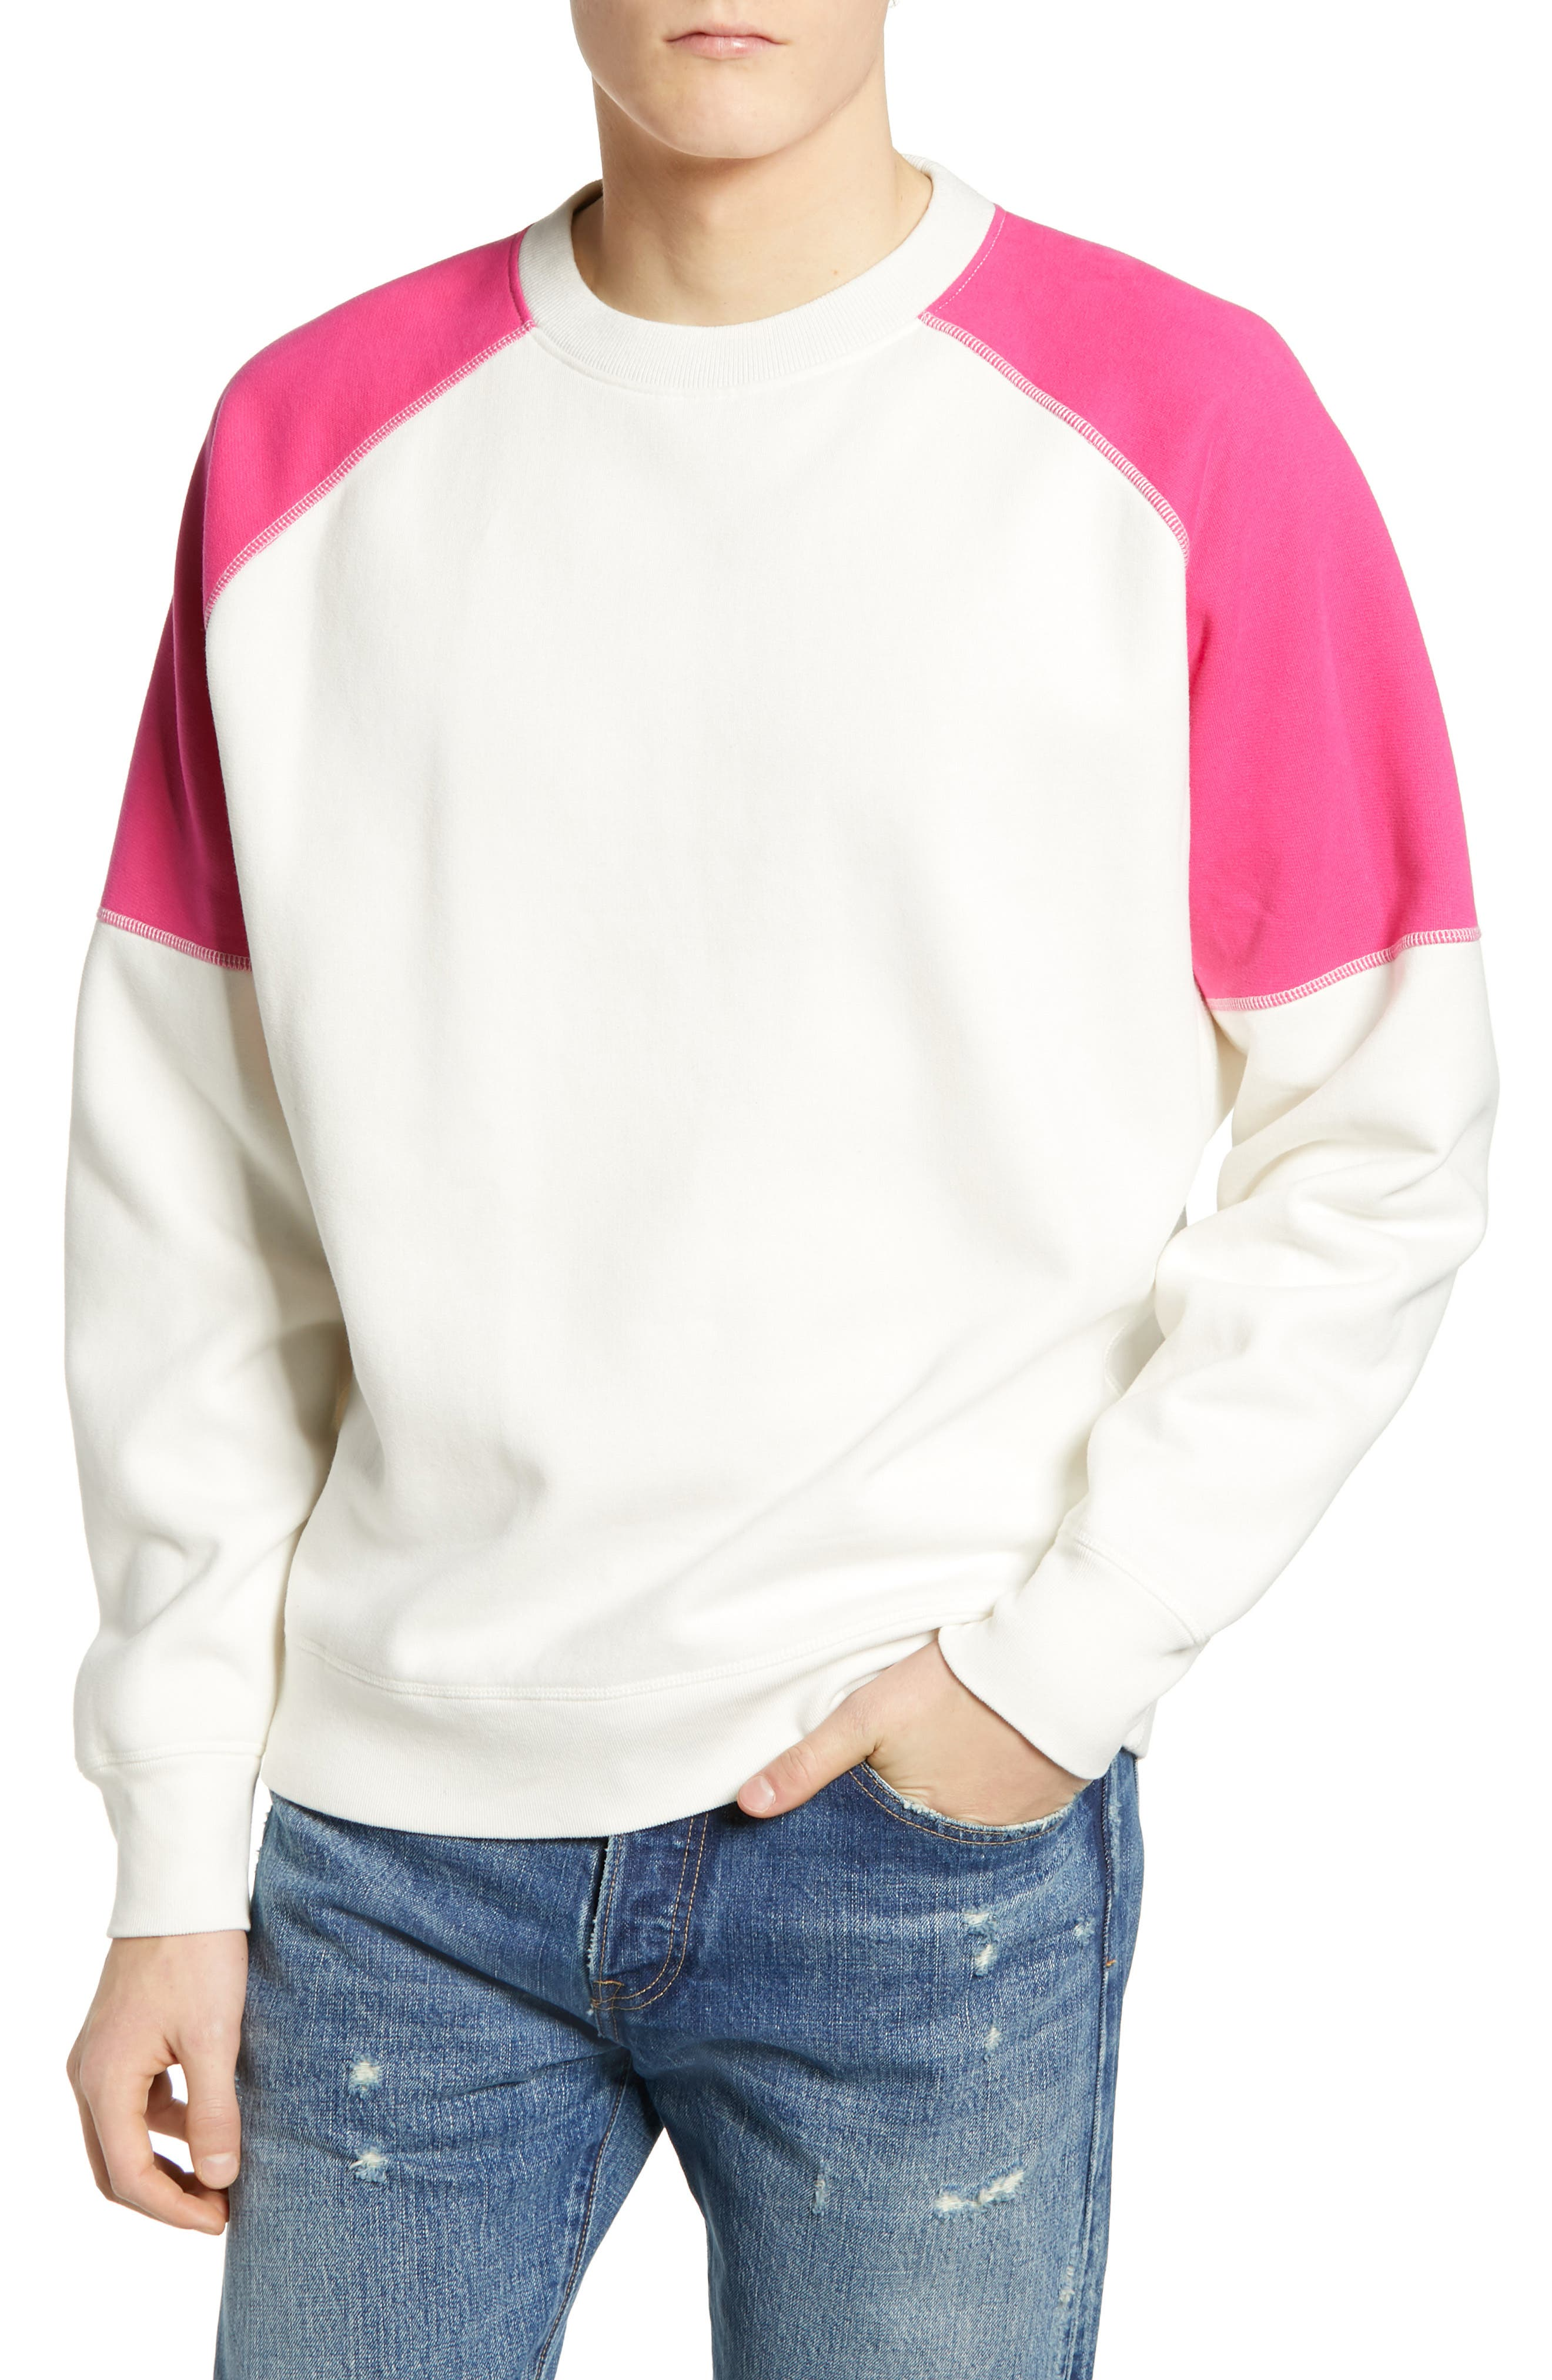 LEVI'S<SUP>®</SUP> MADE & CRAFTED<SUP>™</SUP> Regular Fit Raglan Sweatshirt, Main, color, WHITE ALYSSUM